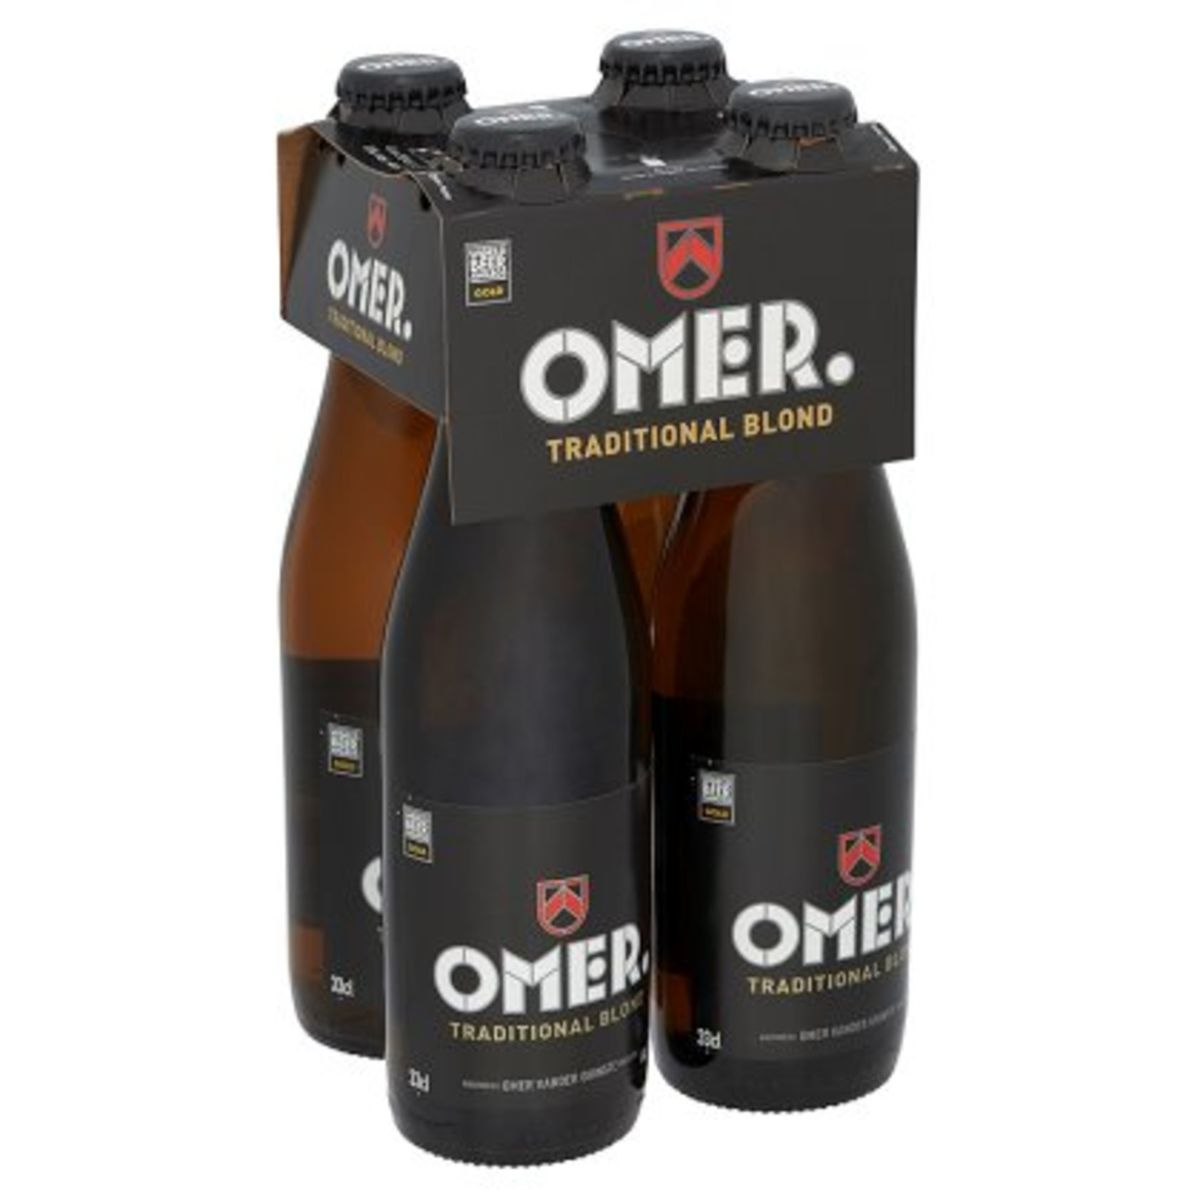 Omer. Traditional Blond Flessen 4 x 33 cl